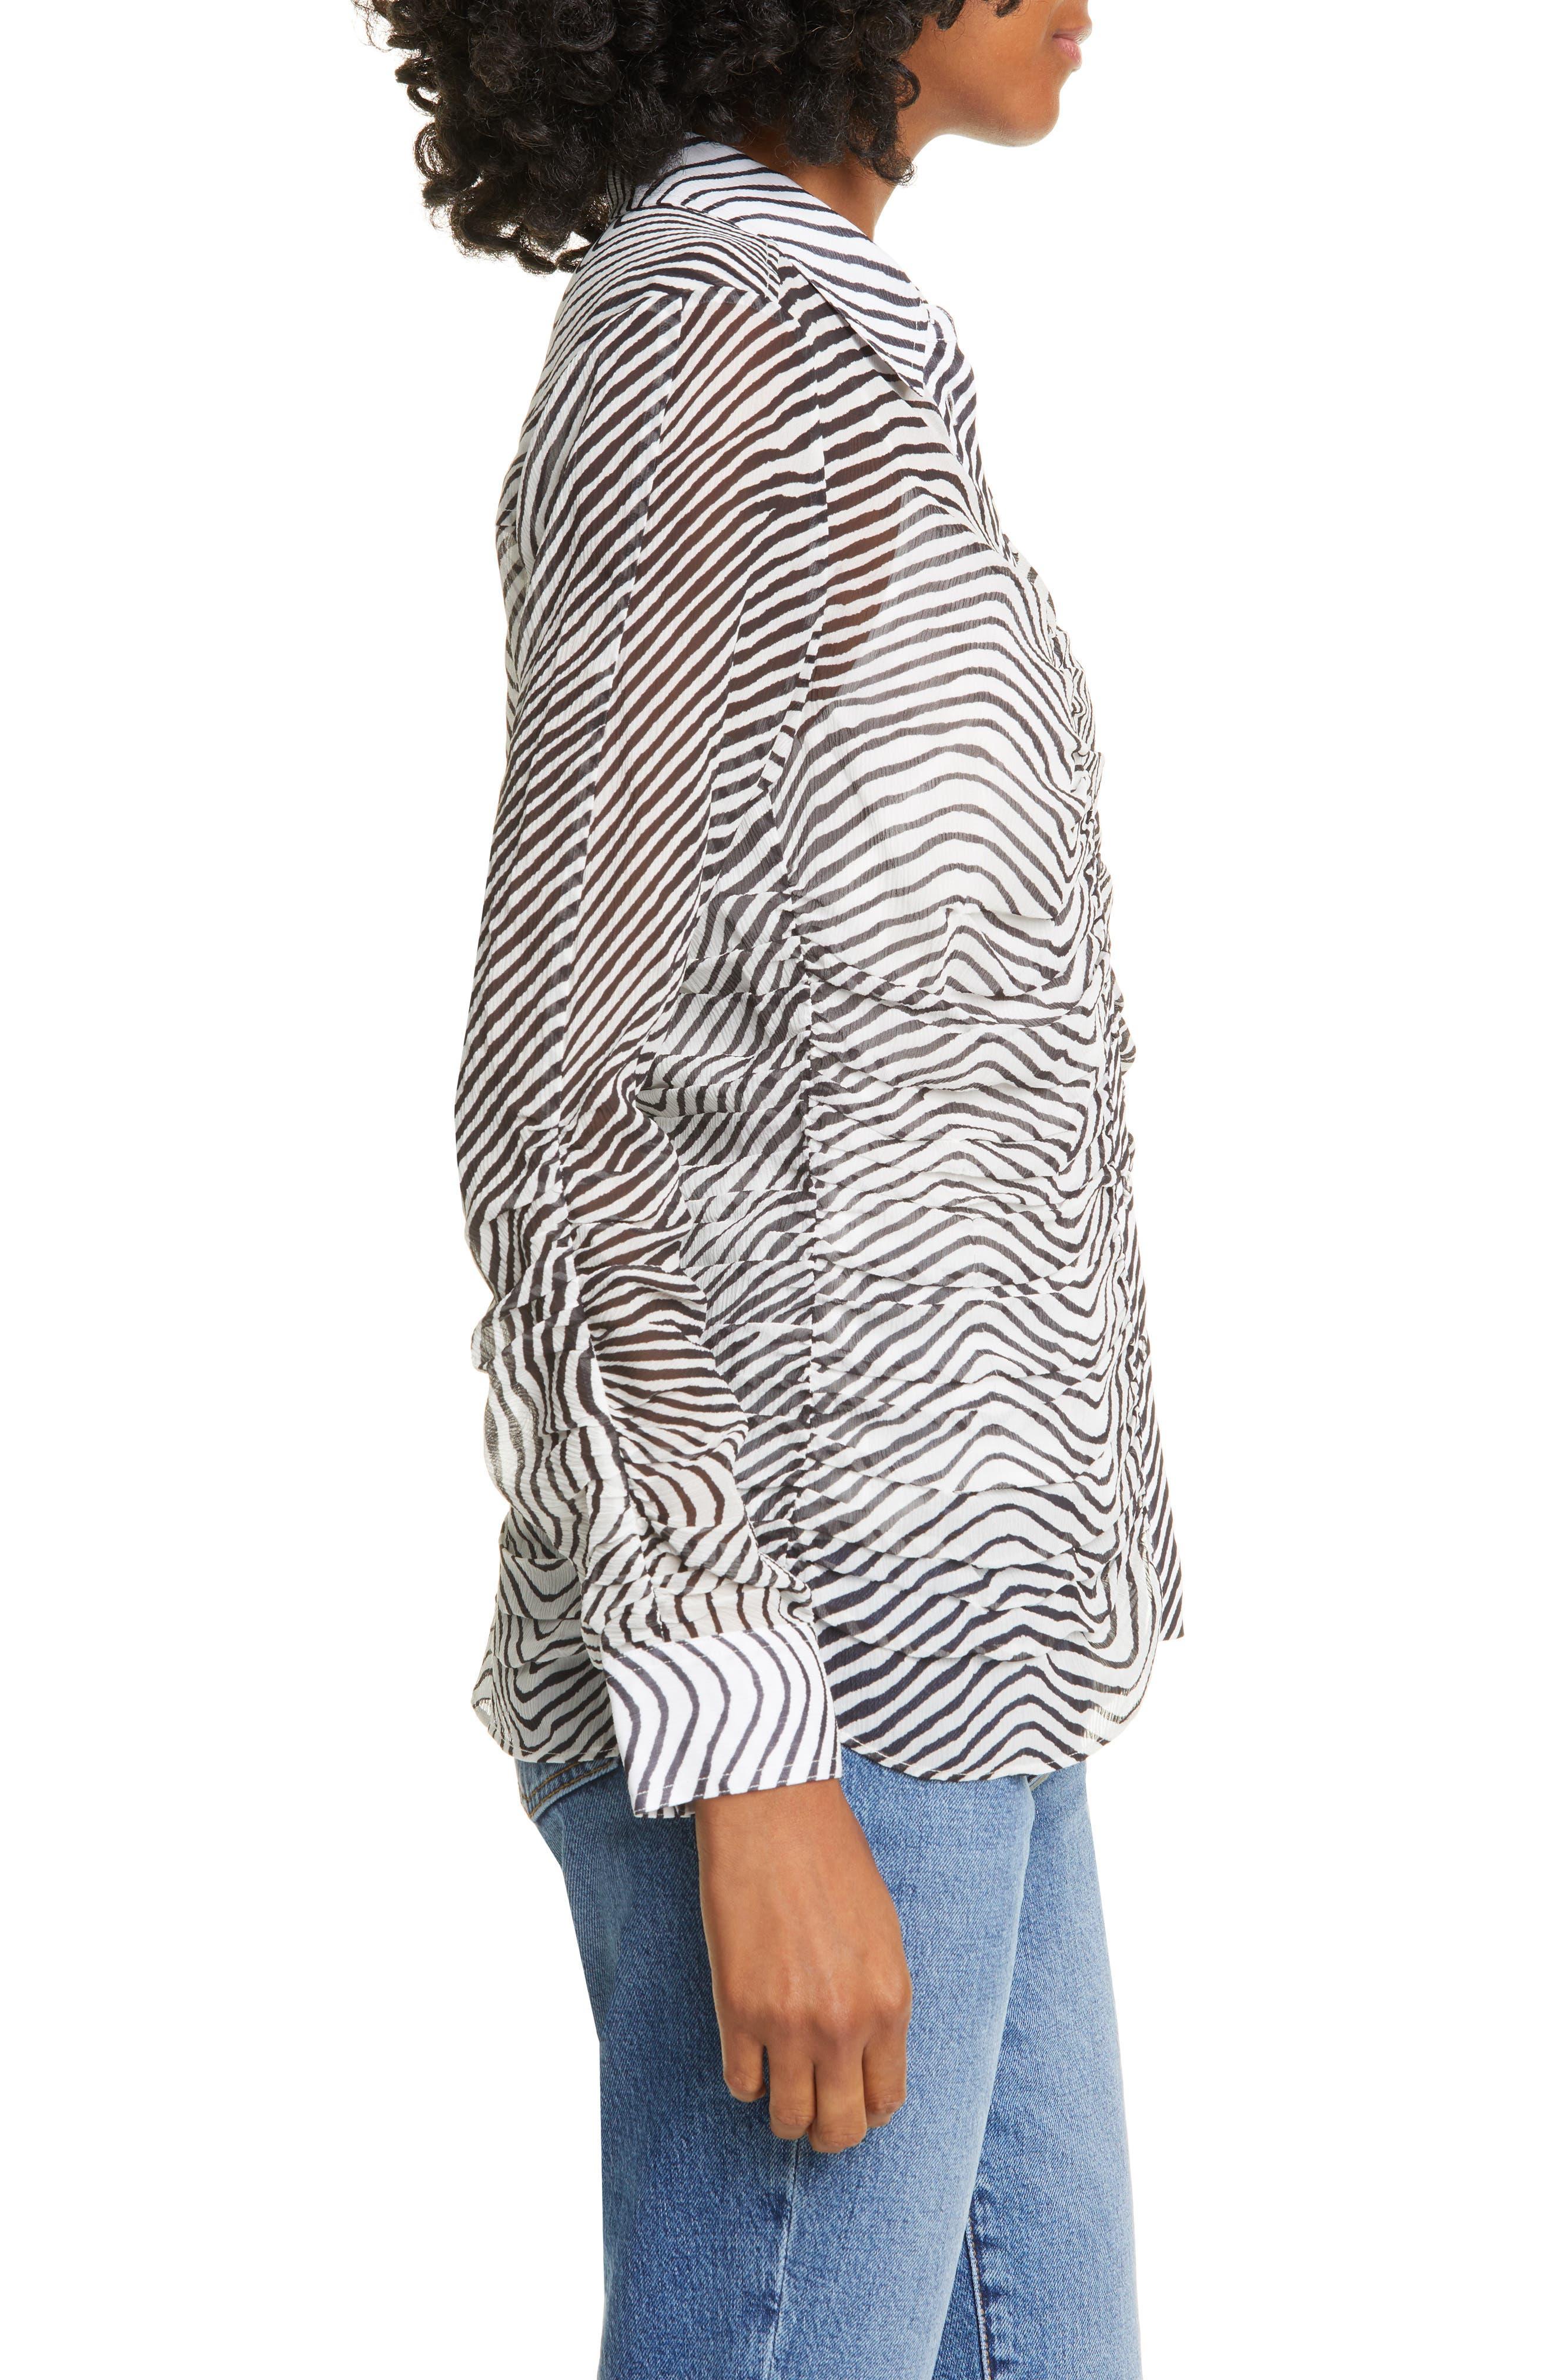 Tanya Taylor Tops Ryann Zebra Print Silk Chiffon Blouse